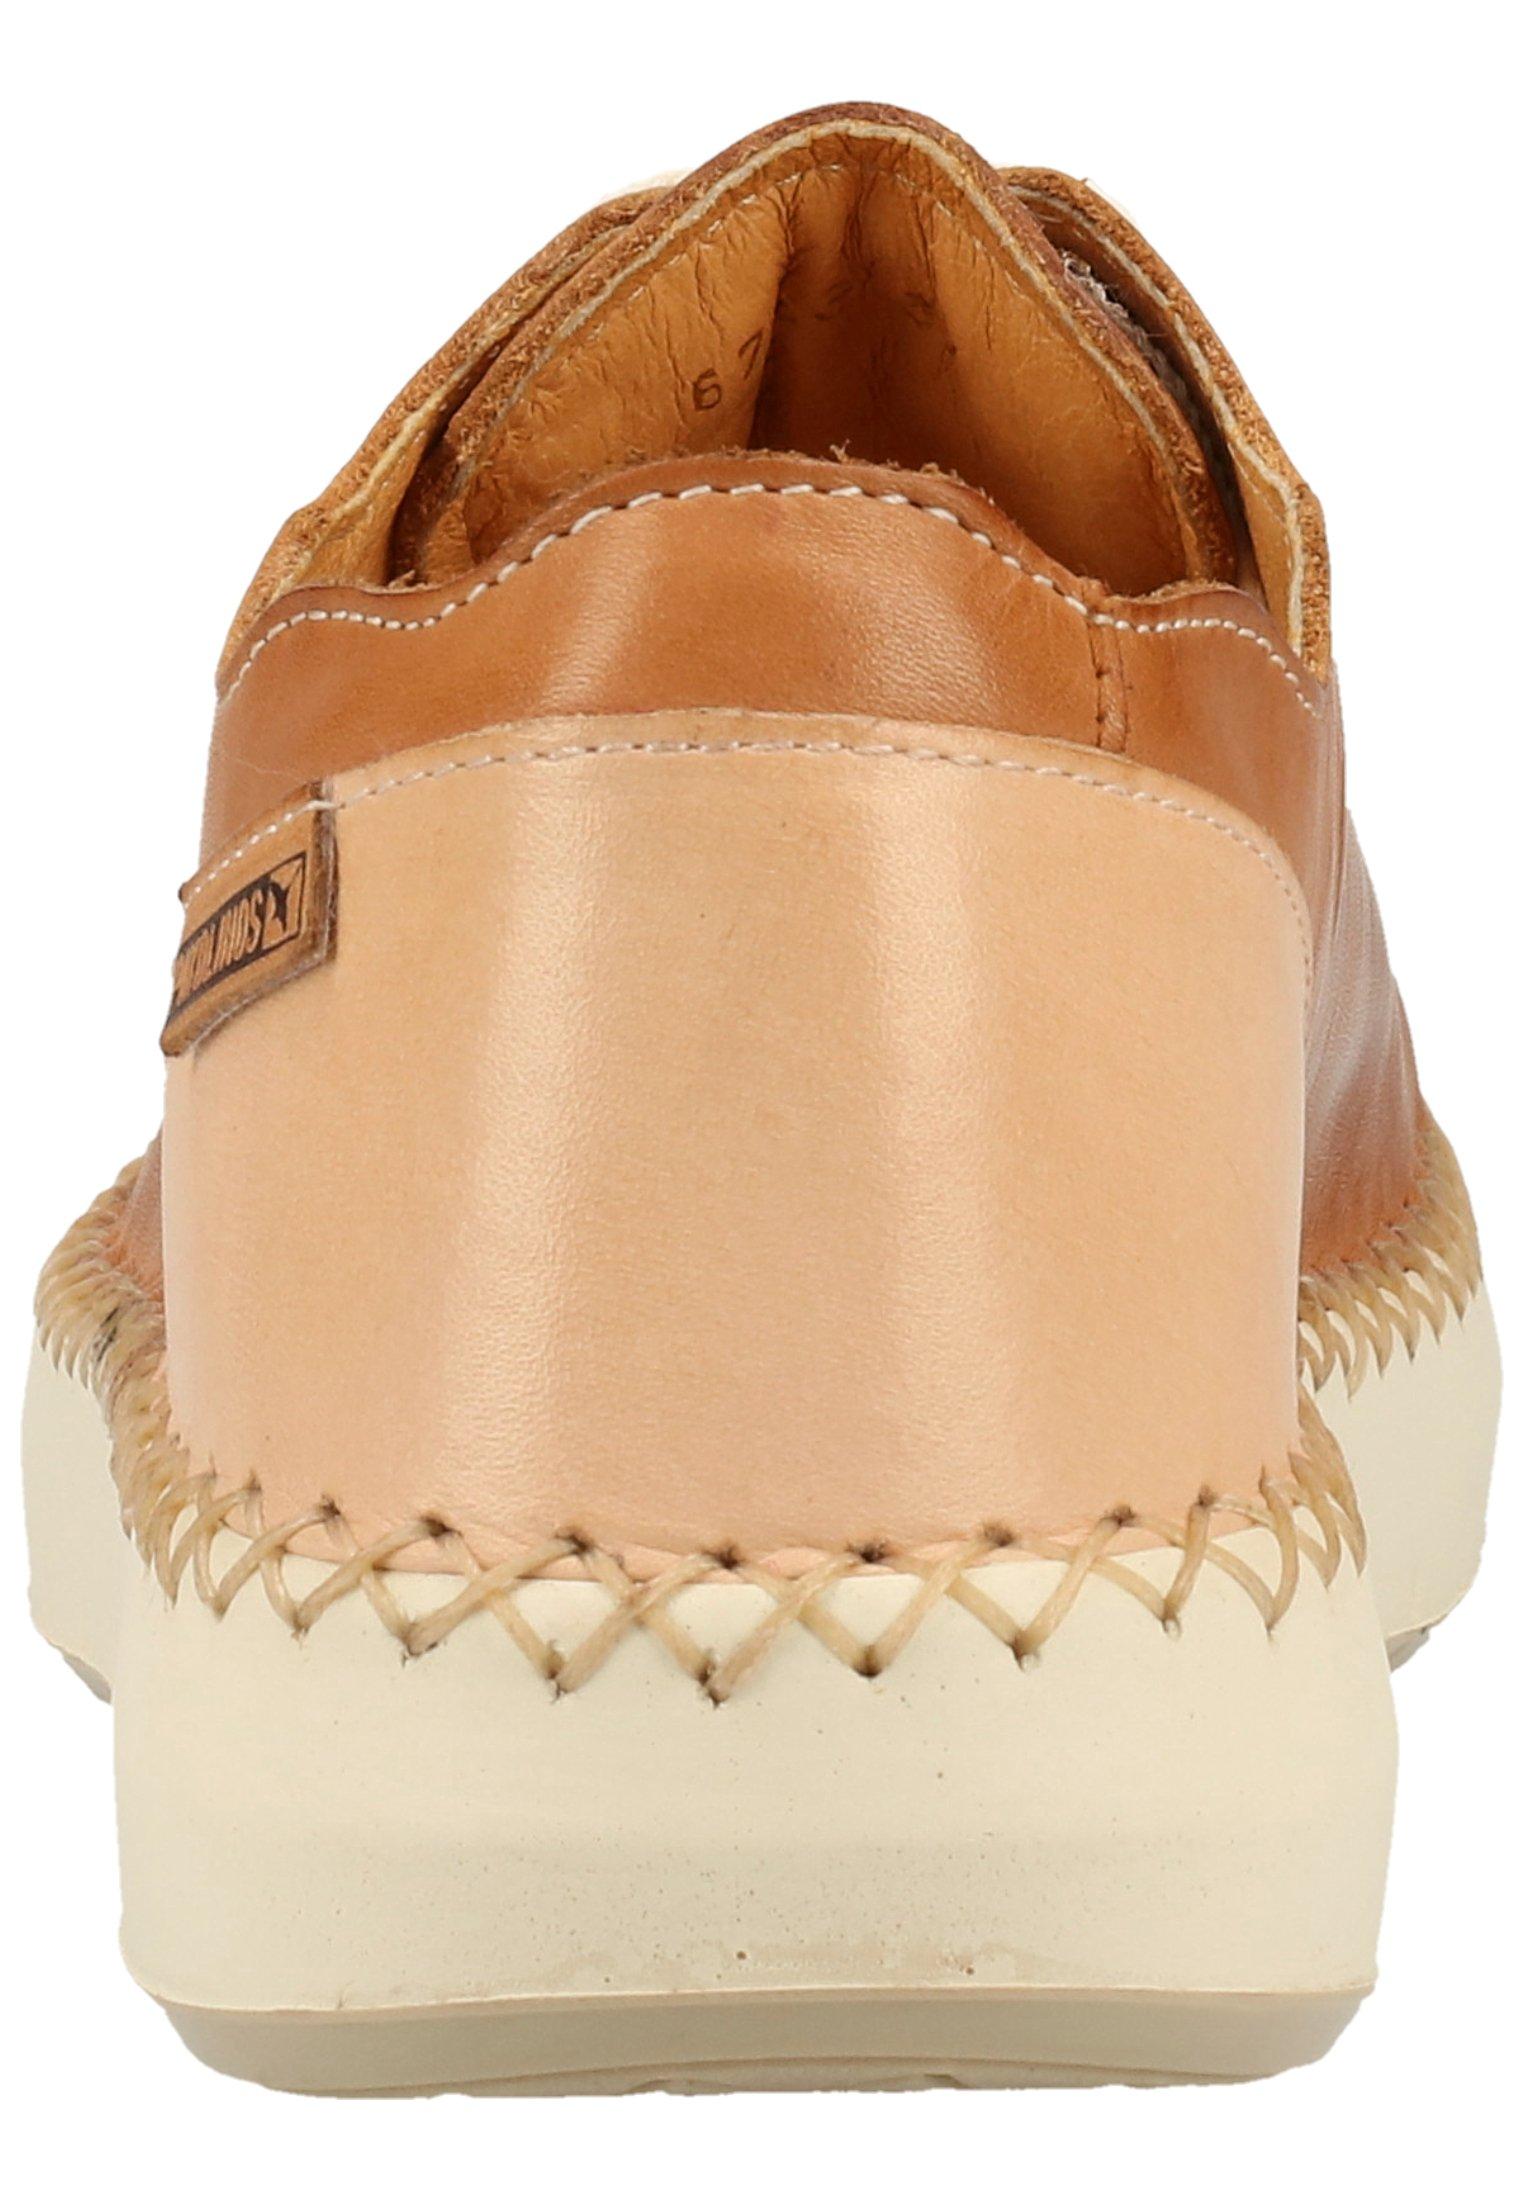 Pikolinos Chaussures À Lacets - Brandy